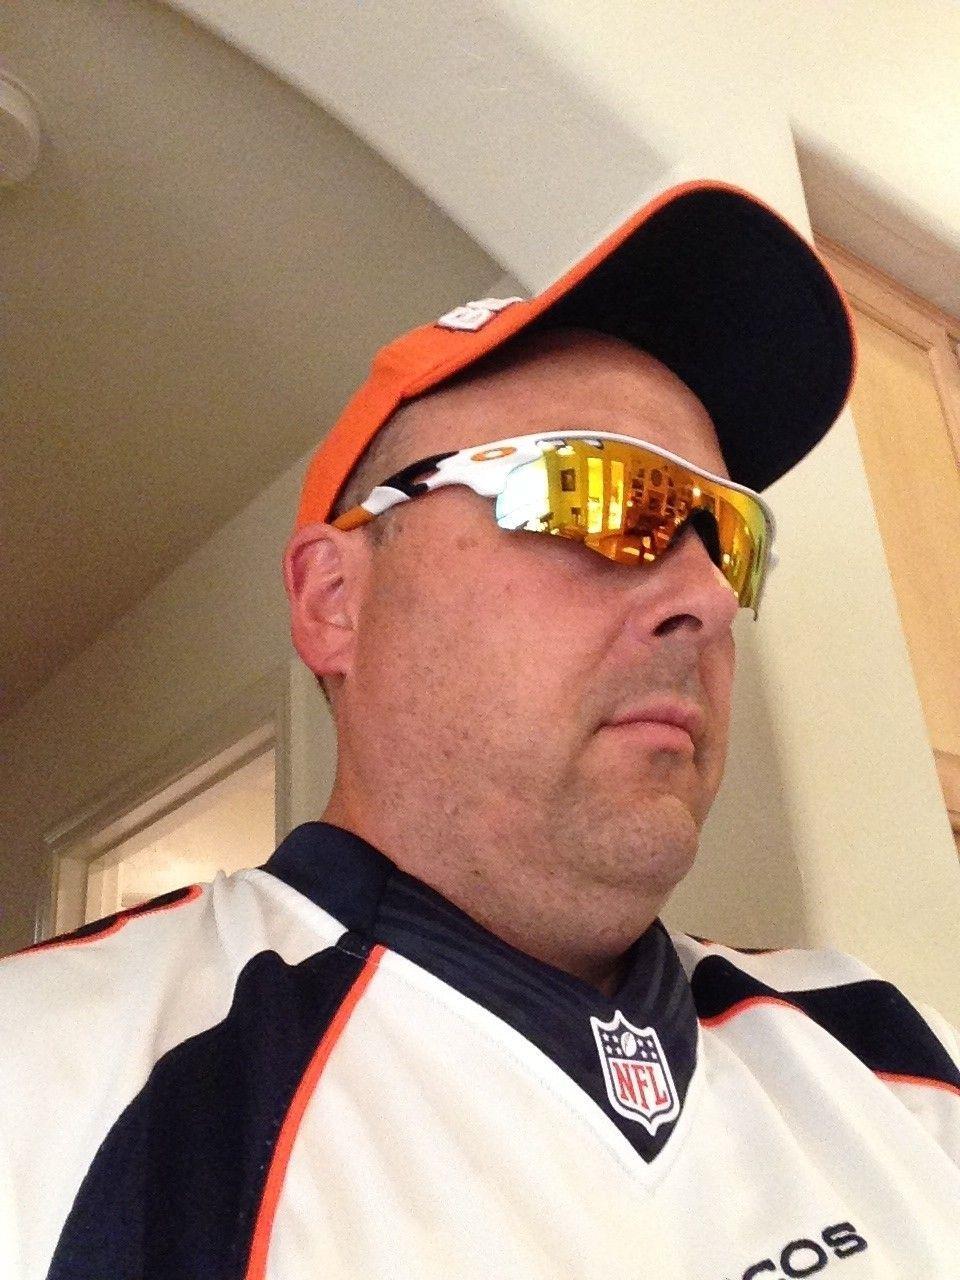 Football Season- Another Excuse For New Glasses - GTJBzN.jpg